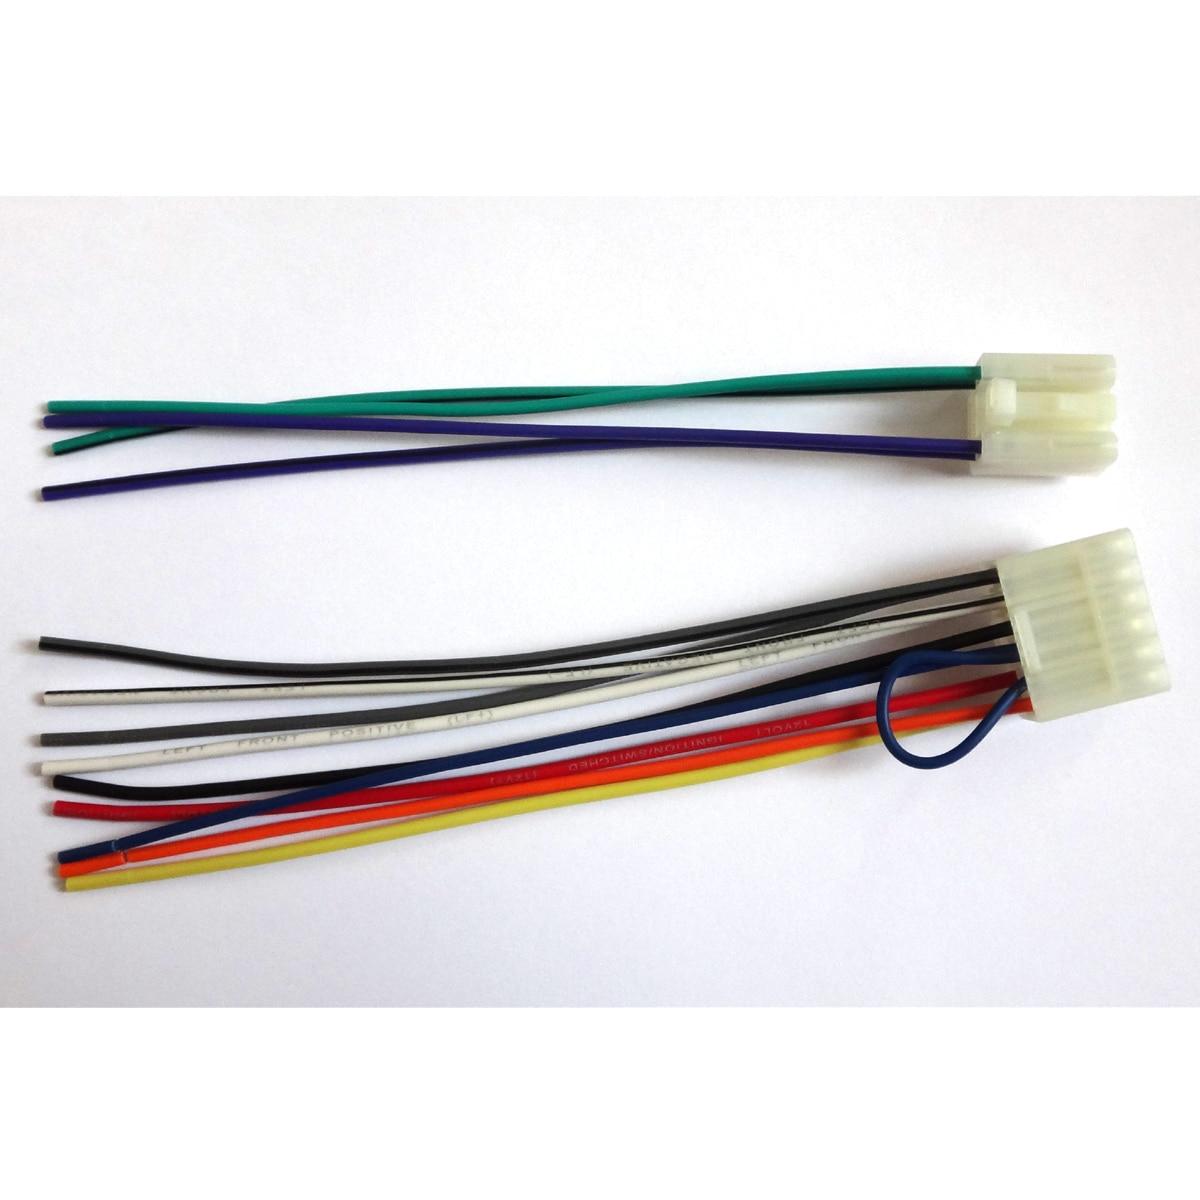 Radio-Reverse-Male-Wire-Wiring-Harness-Scion-Fr-S-Iq-Tc-Xa-Xb-Xd Vehicle Radio Wiring Harness on